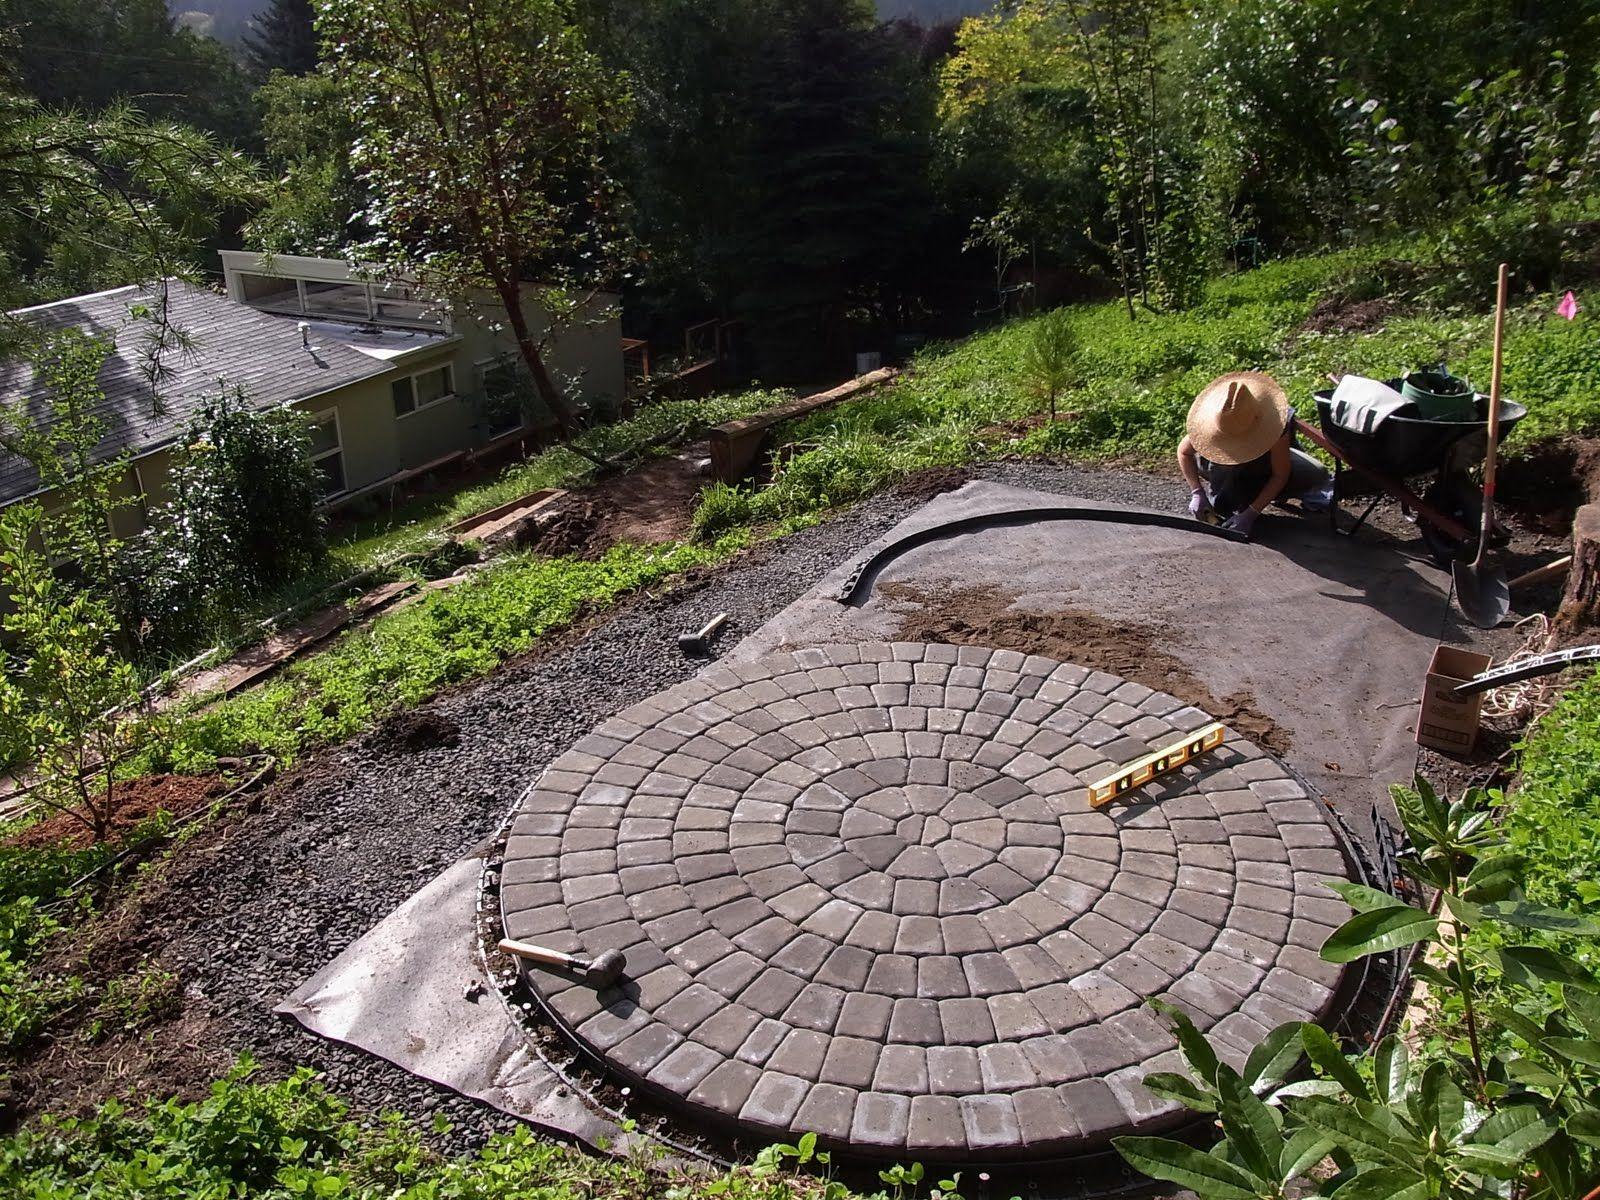 rockwood round patio kit w/ inlay dimensions: 12' diameter $1275 ... - Round Patio Ideas